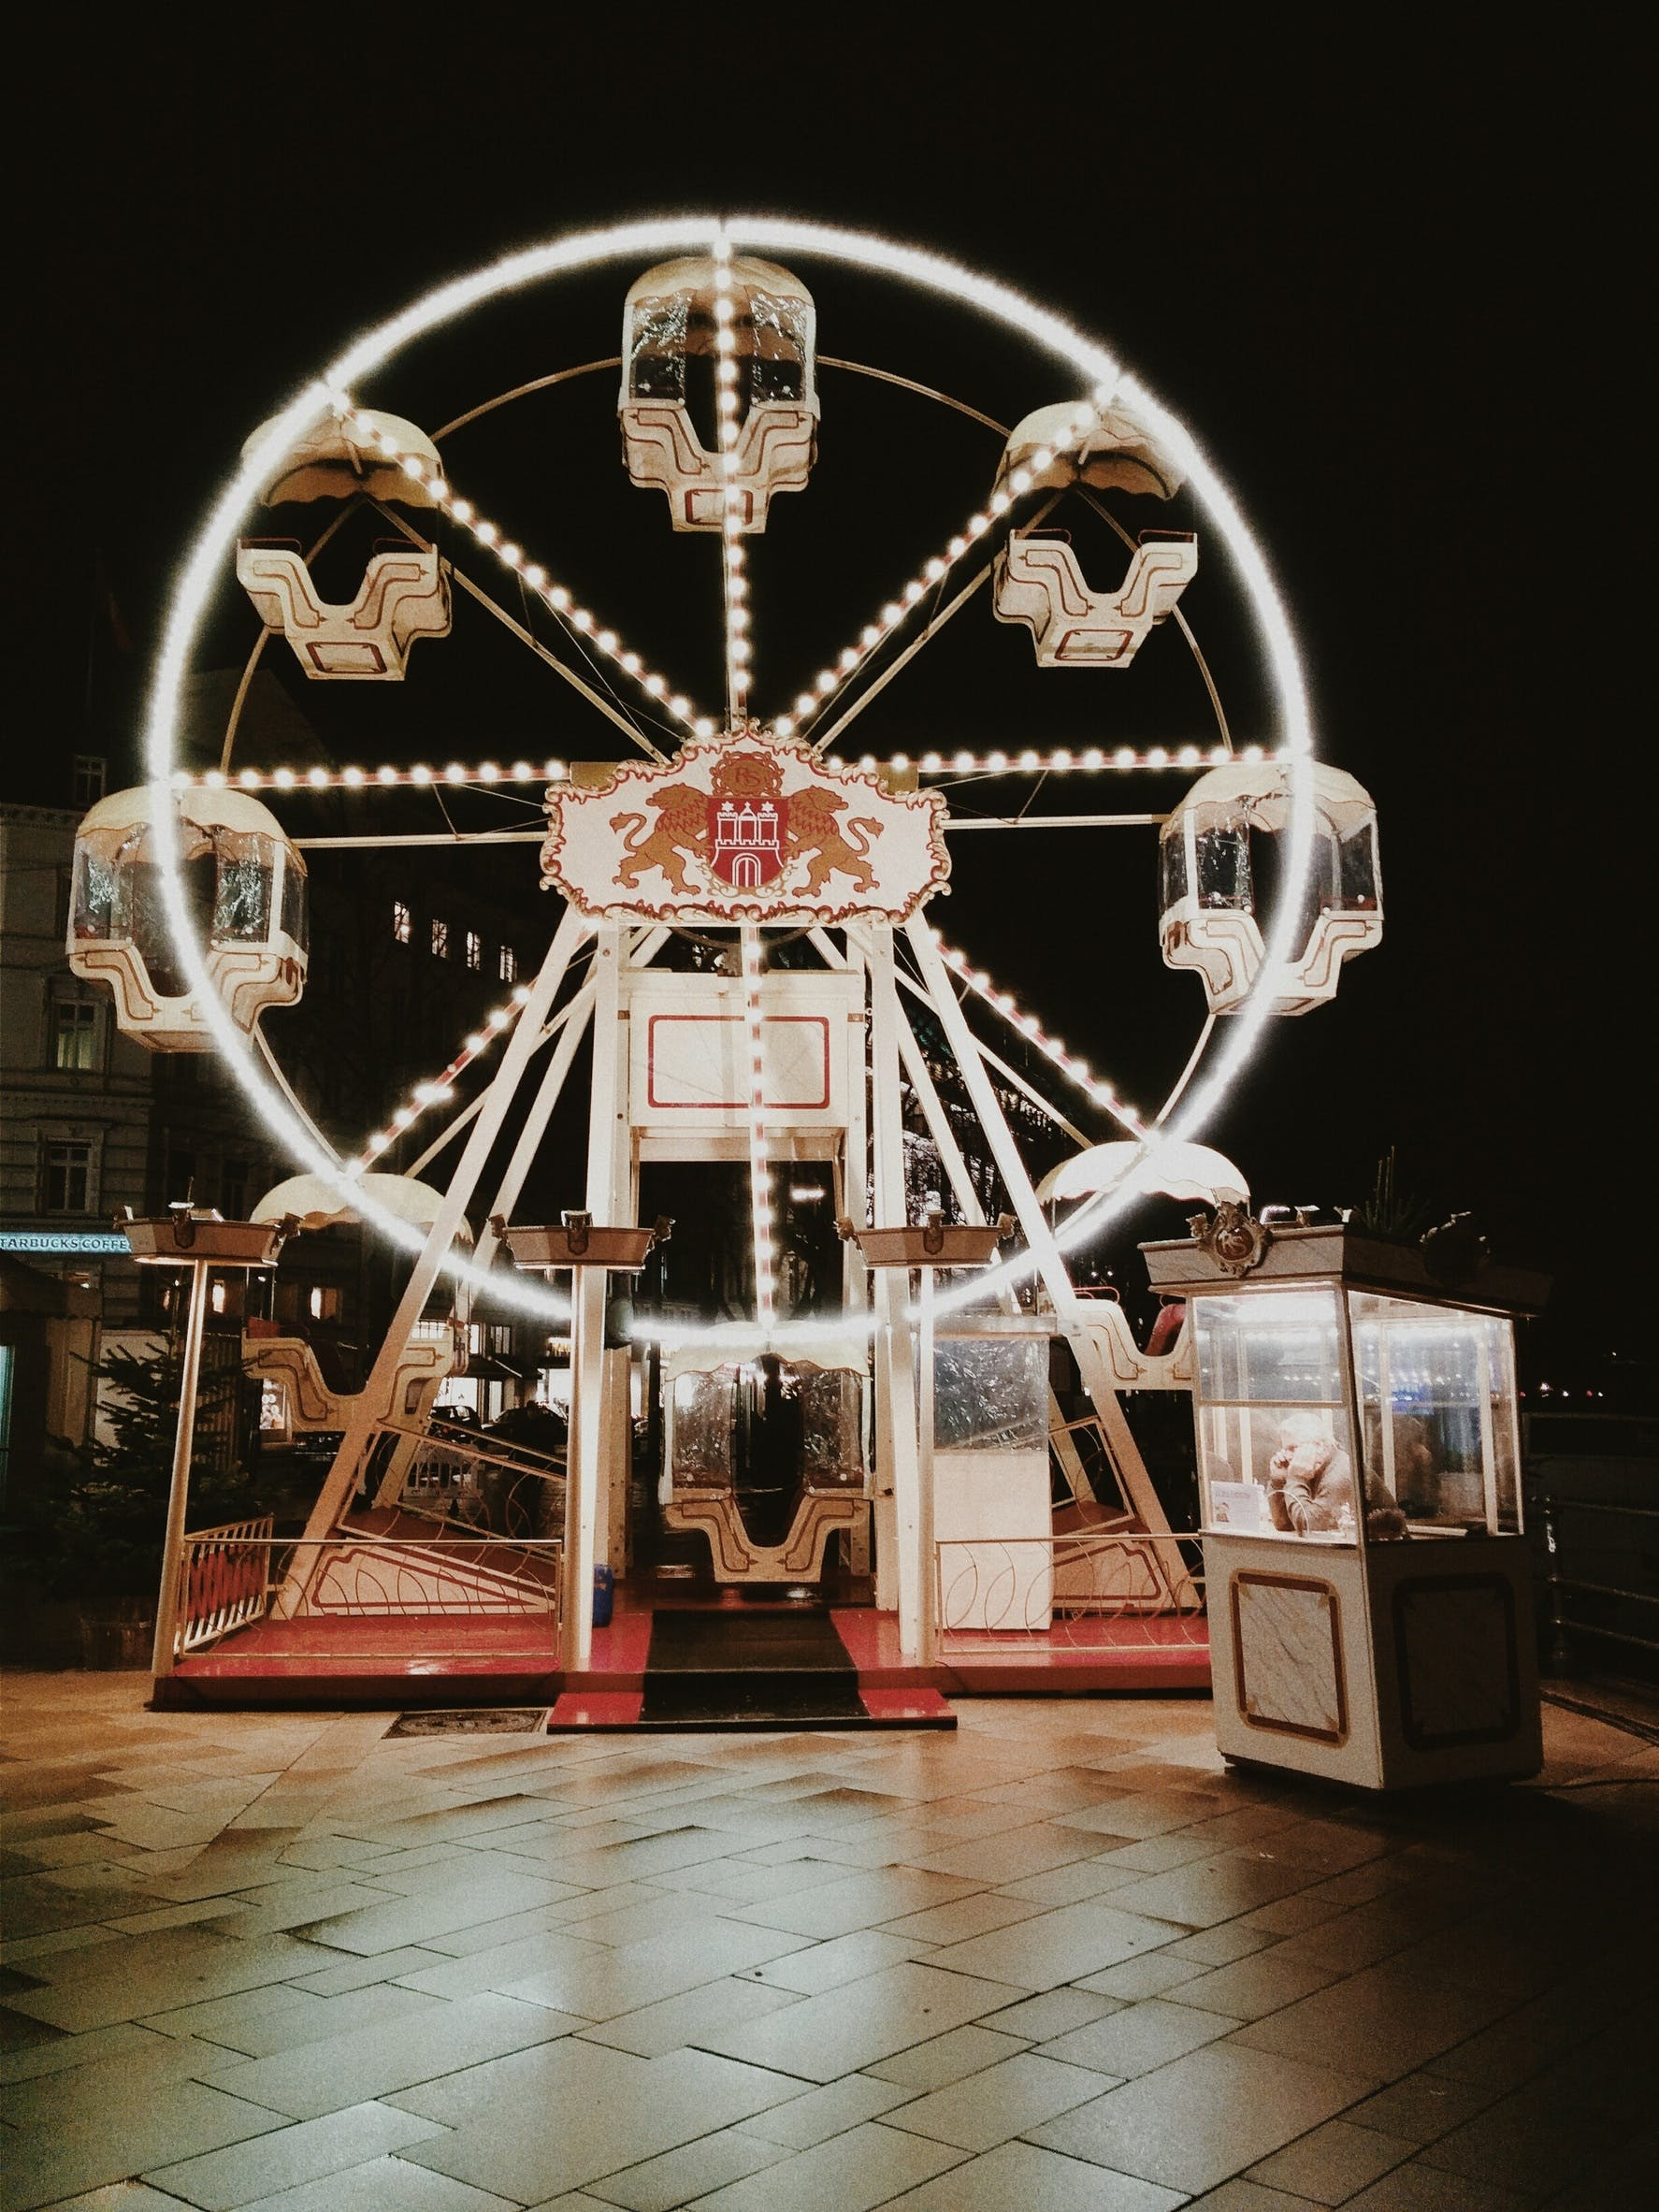 Empty Ferris Wheel Lightened at Night